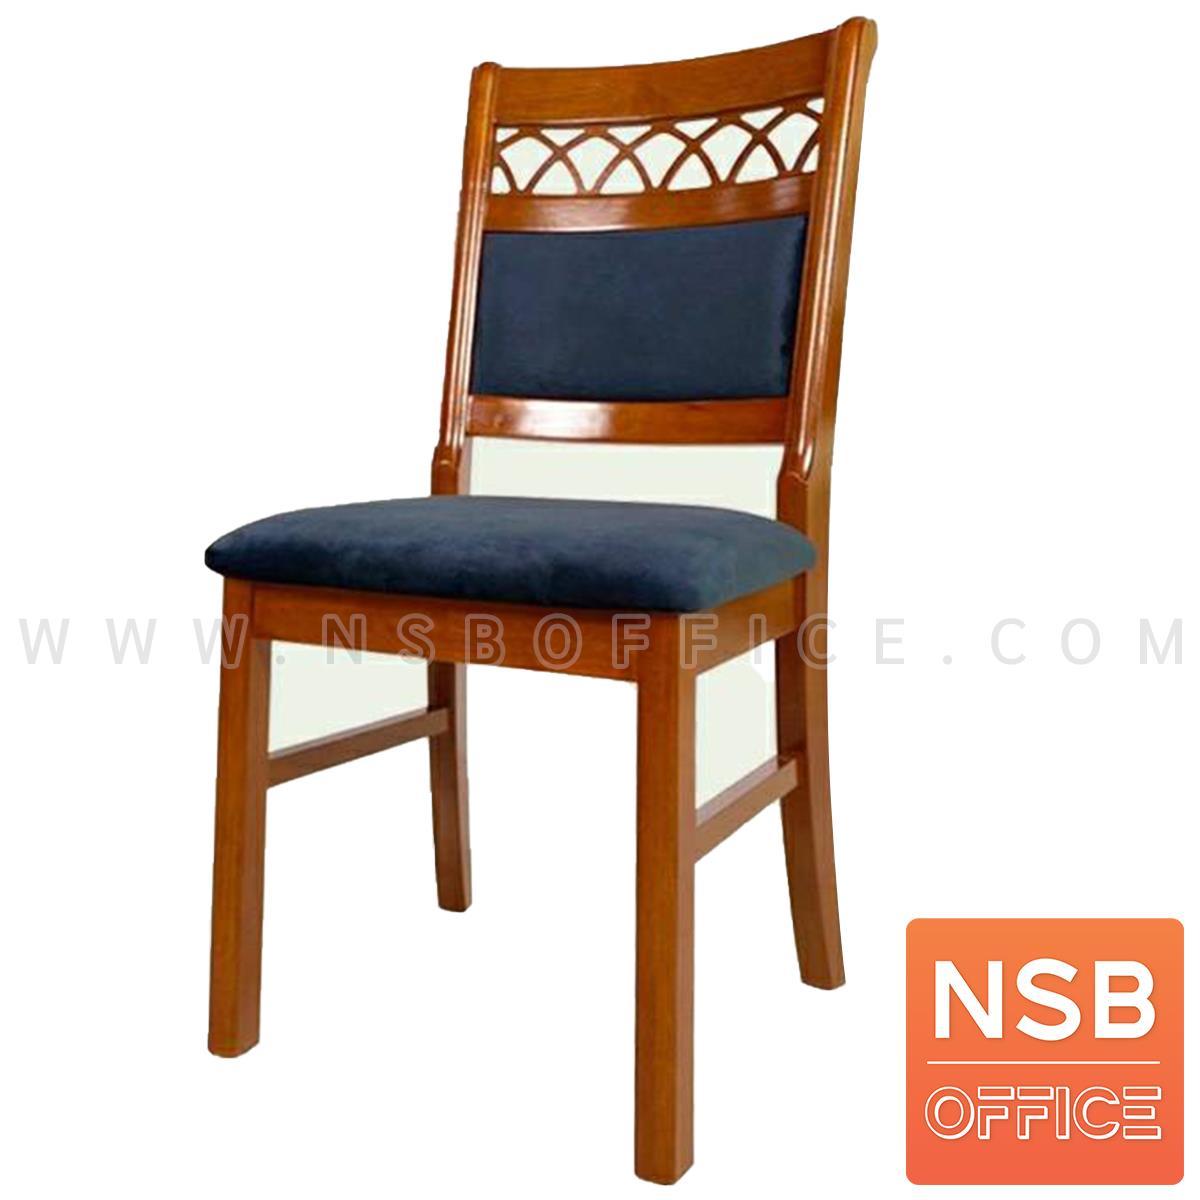 B22A195:เก้าอี้รับประทานอาหาร รุ่น Orchid (ออคิด)  เบาะหุ้มผ้า ขาไม้ยางพารา